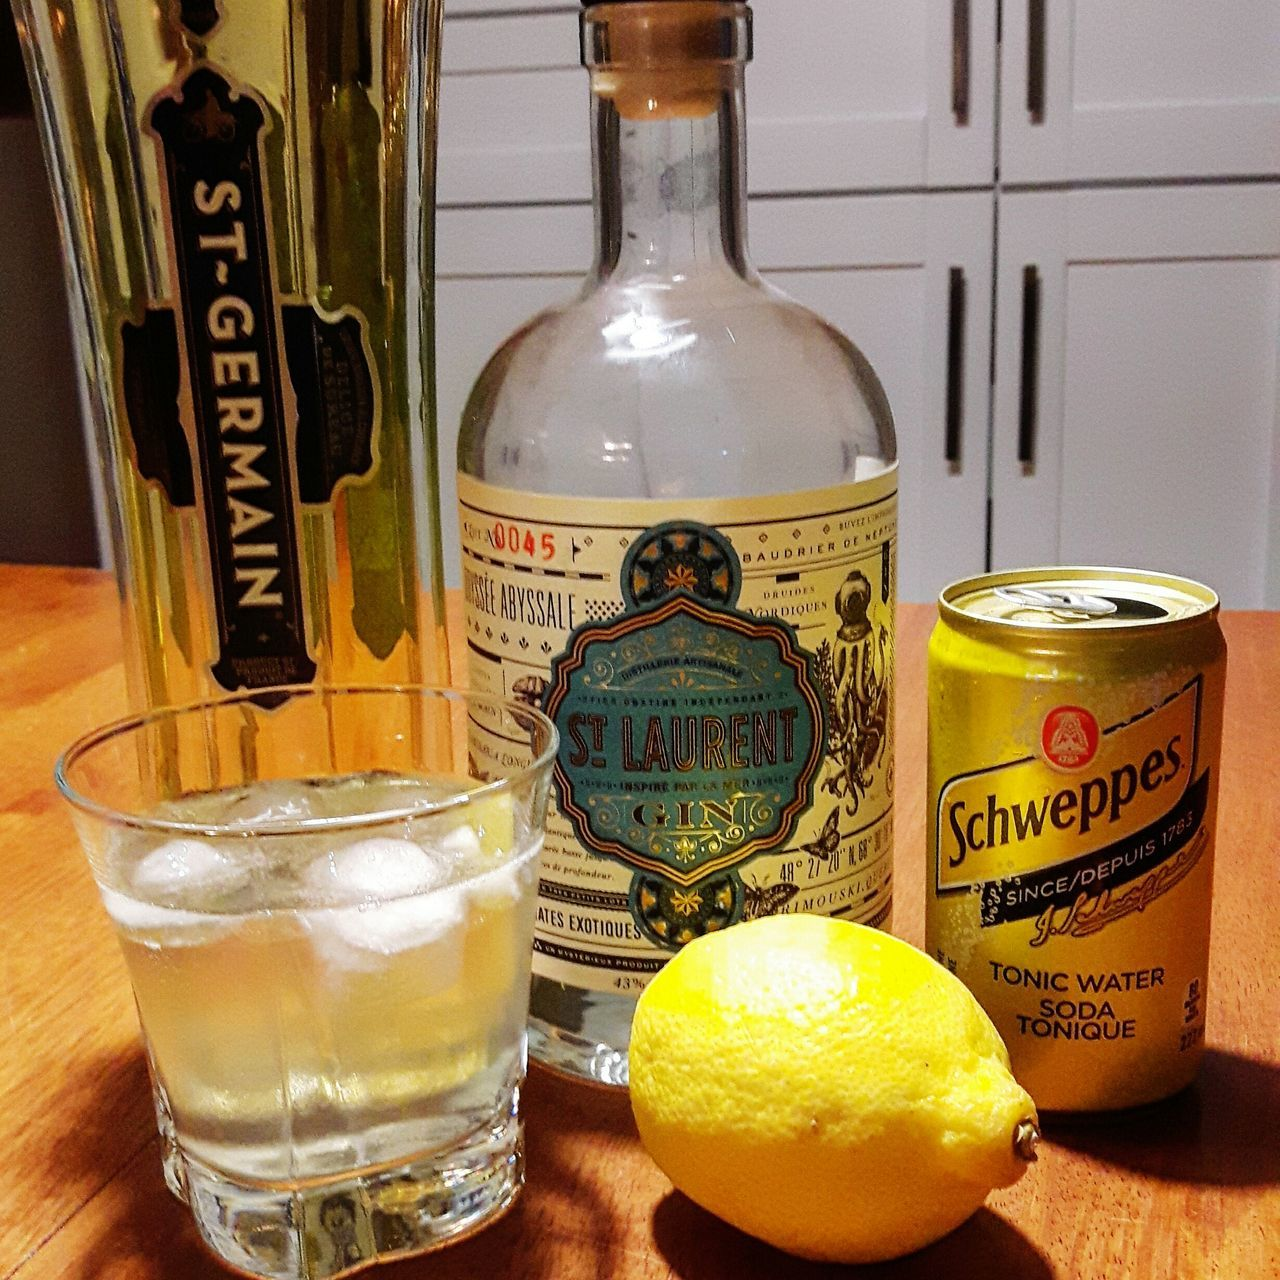 Drink Gin Tonic Gintonic Citron Gintonic Time Tonic St-germain Tonicwater Relaxing Time Relaxing Moments